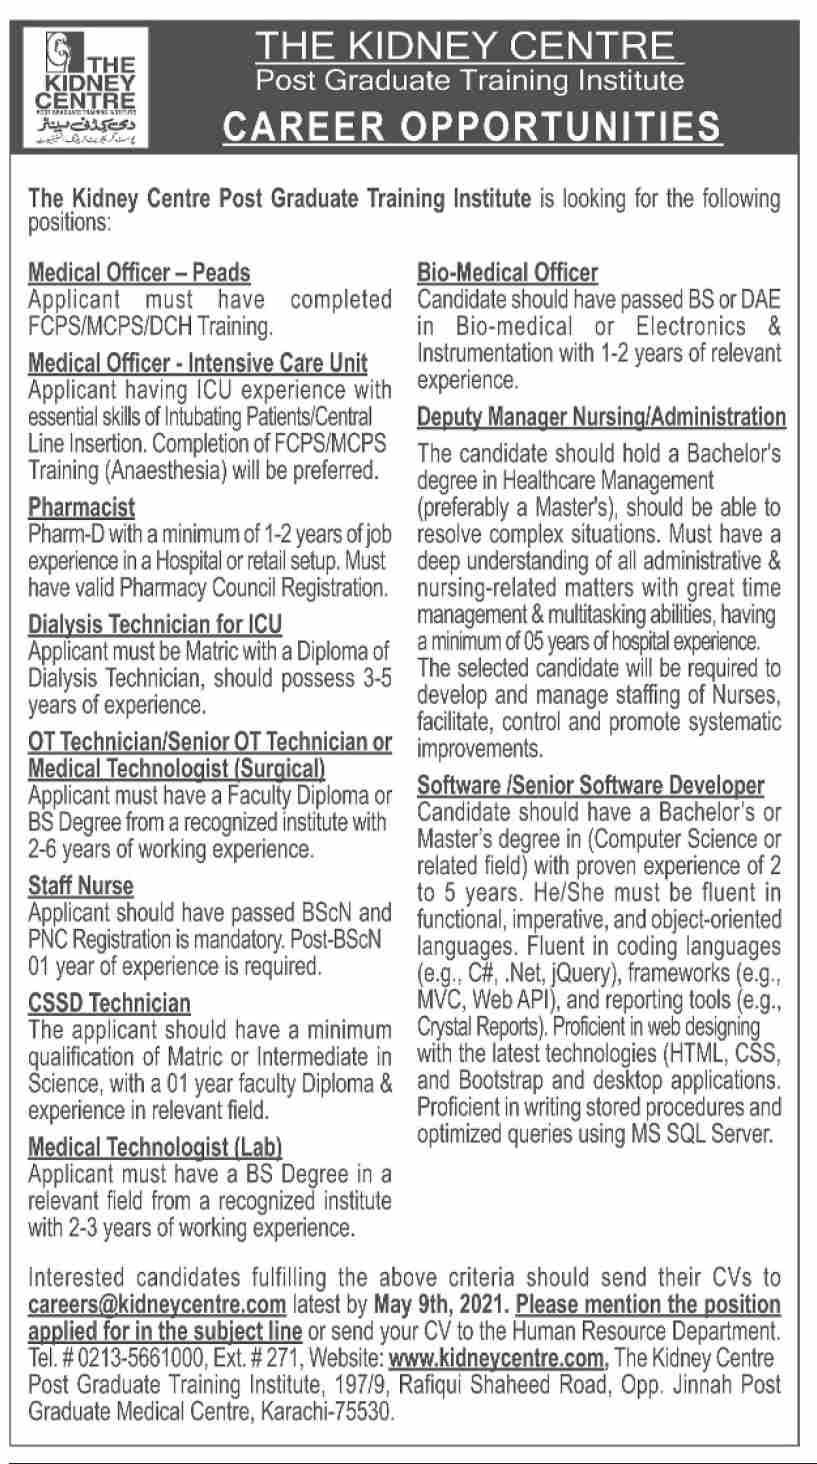 Kidney Center Post Graduate Training Institute Karachi Jobs 2021 in Pakistan